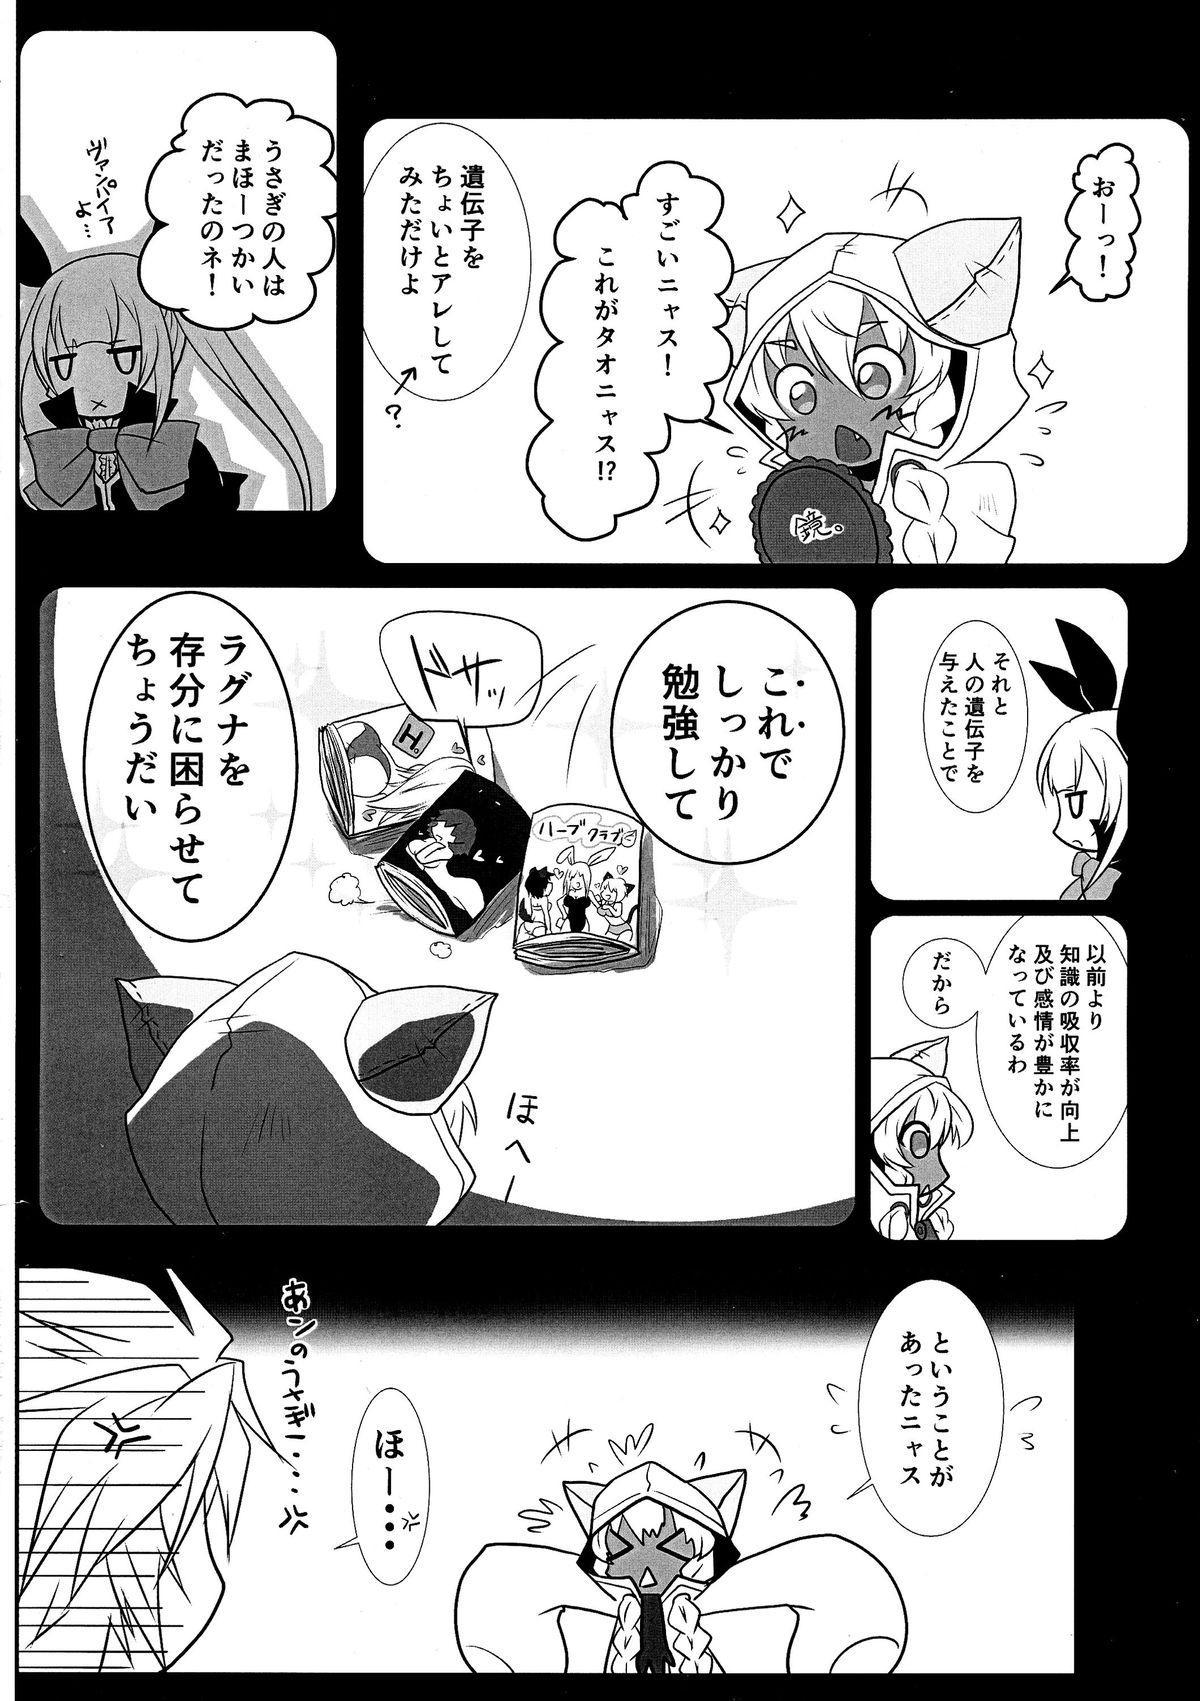 Tao no Ongaeshi 15